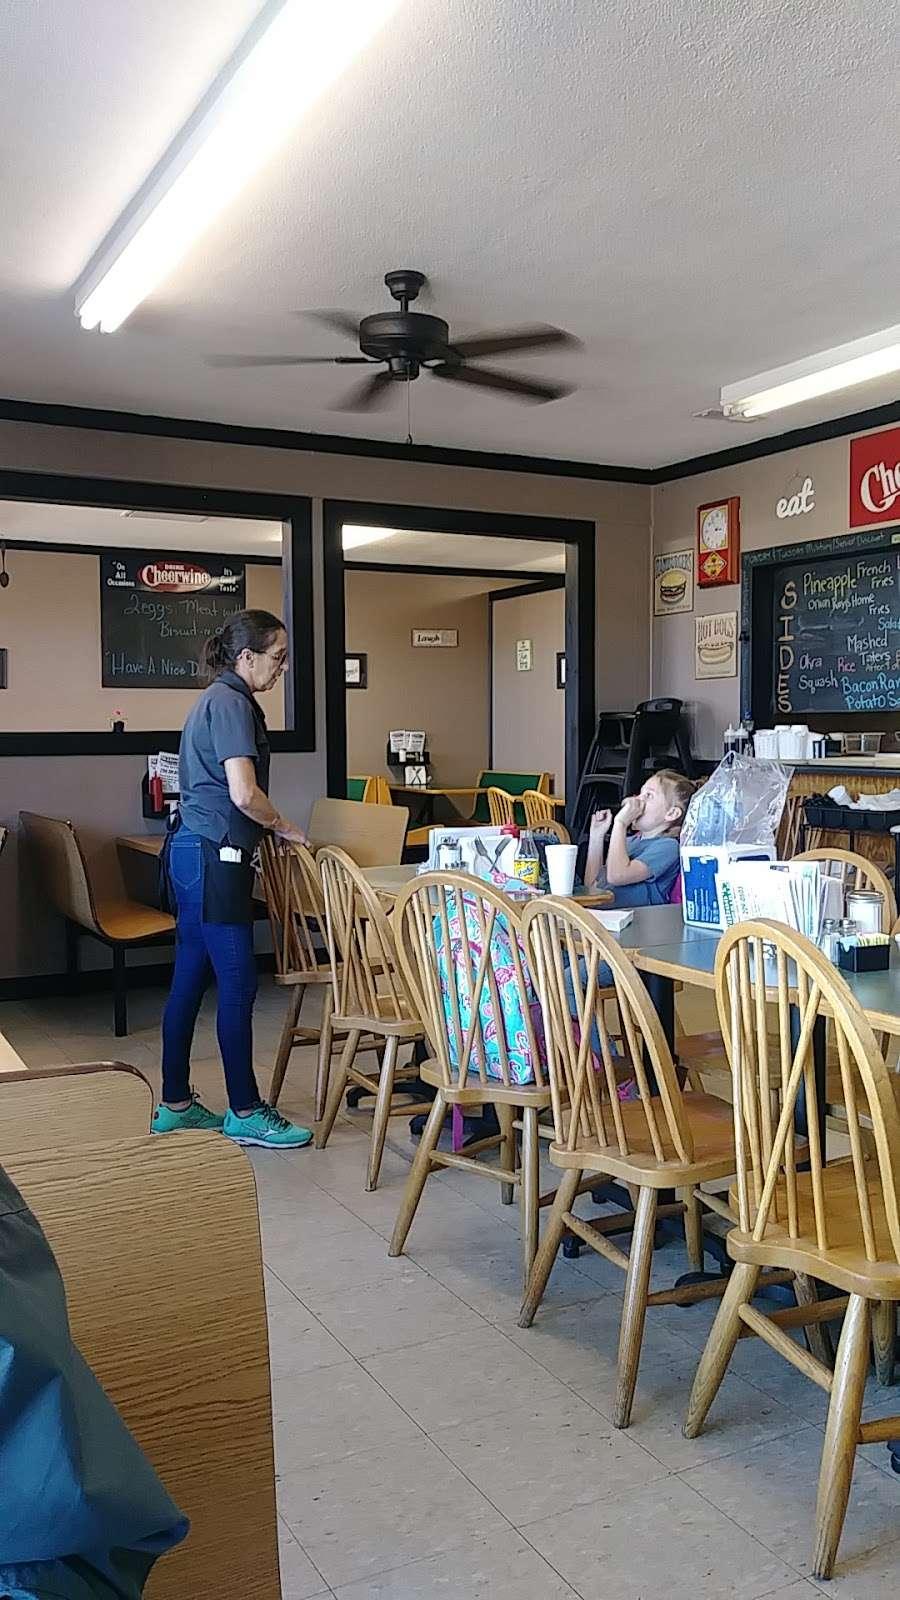 Wahoos Diner - restaurant  | Photo 1 of 9 | Address: 110 N Salisbury GQ Ave, Salisbury, NC 28146, USA | Phone: (704) 209-0503